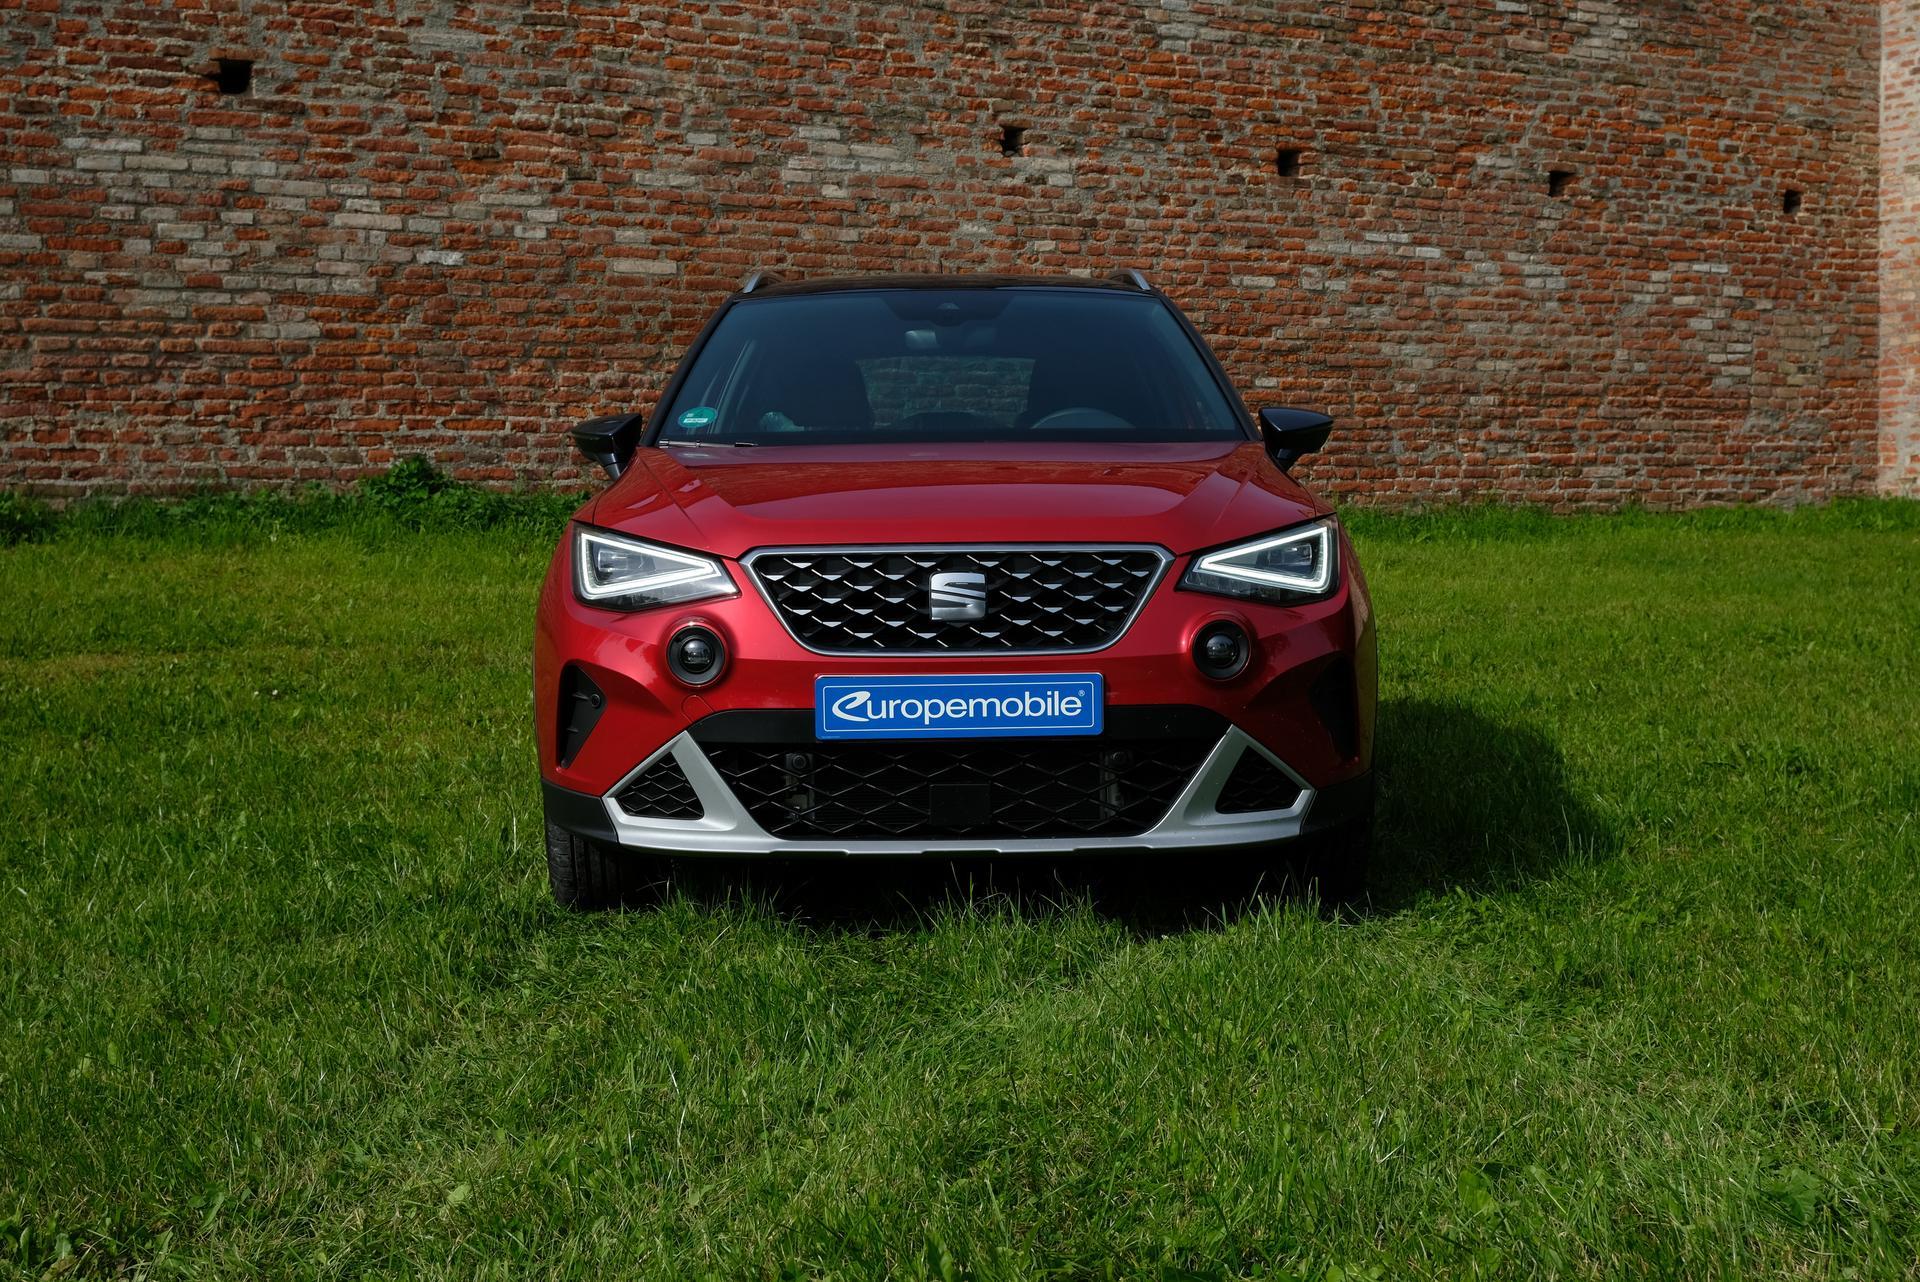 Facelift: SEAT Arona 1.0 TGI 2021